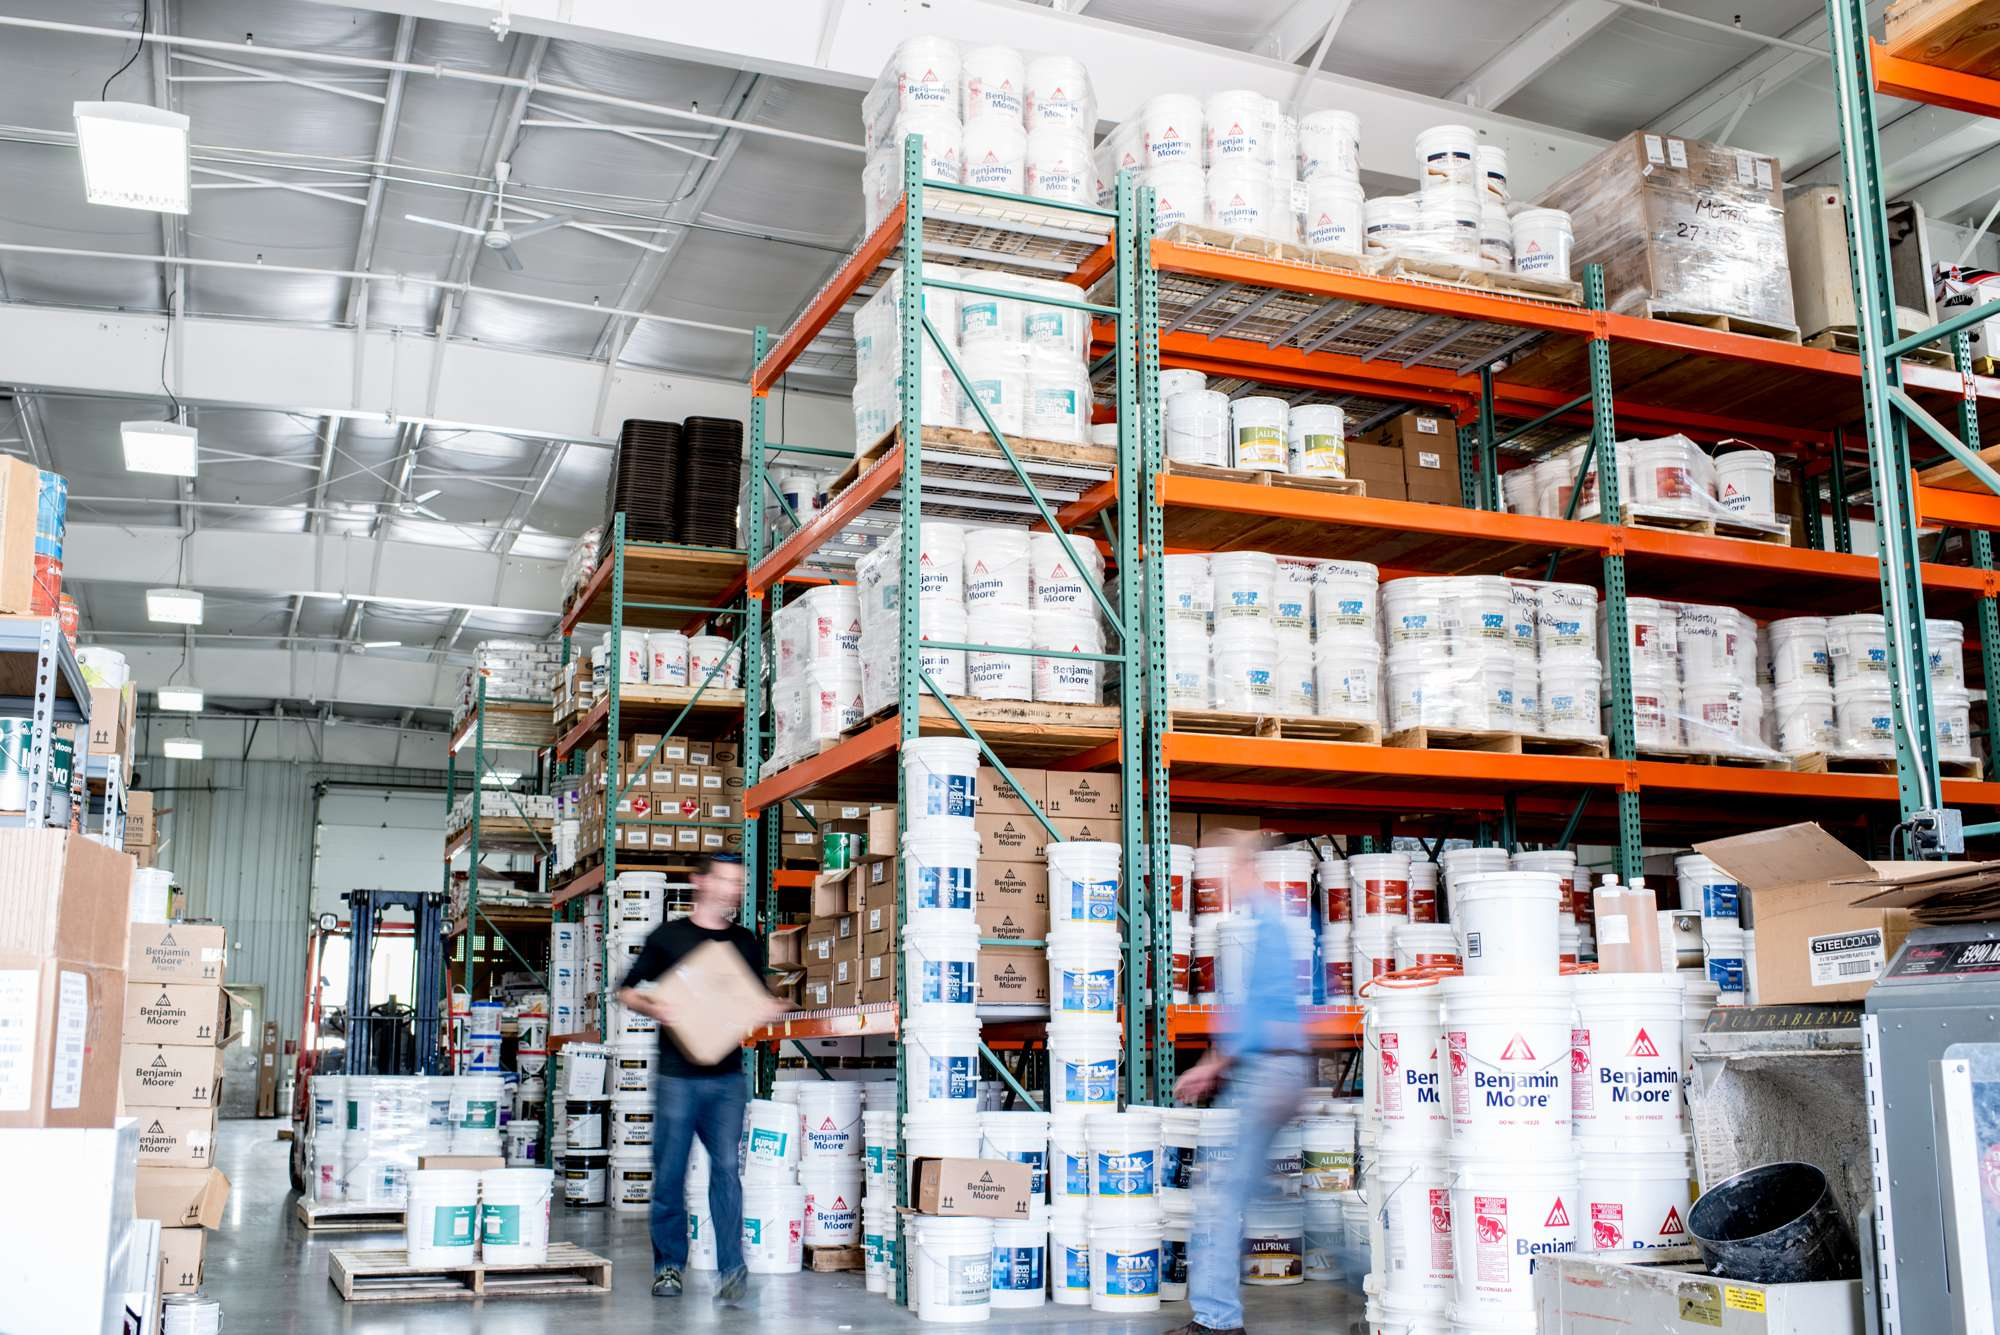 The Johnston Paint & Decorating warehouse